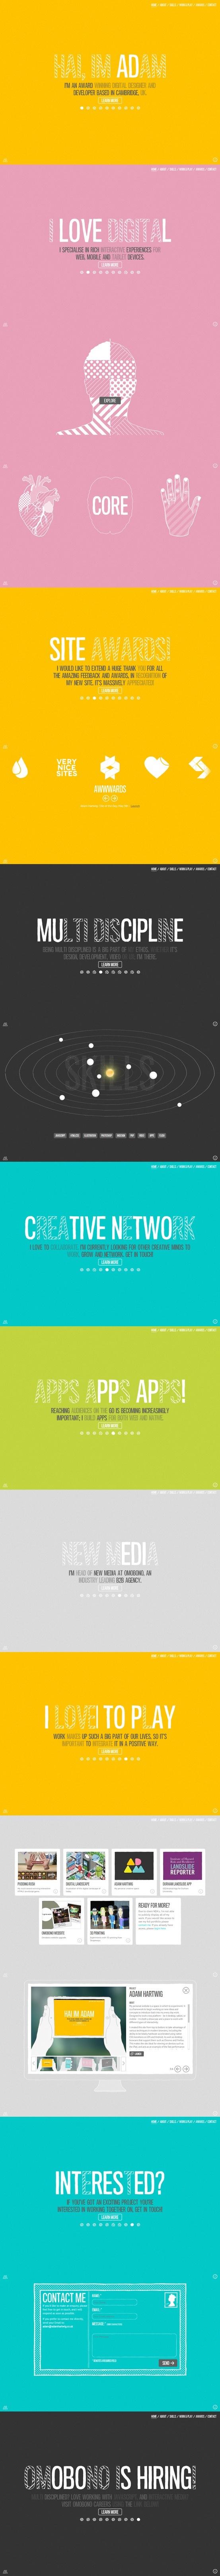 Adam Hartwig 9 May 2013 http://www.awwwards.com/web-design-awards/adam-hartwig #webdesign #inspiration #UI #Clean #Minimal #Flexible #Illustration #Animation #HTML5 #White #Yellow